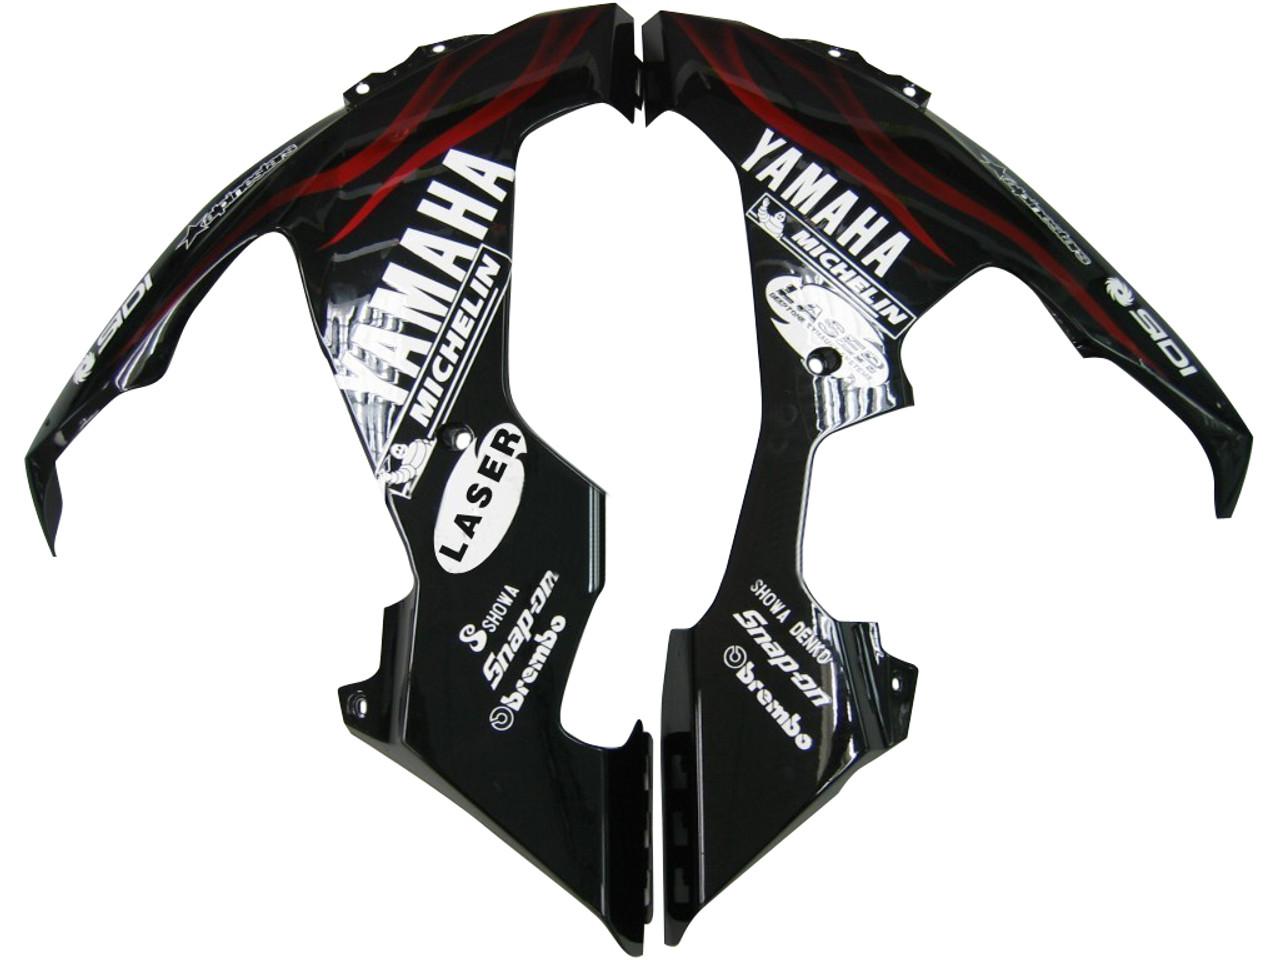 Fairings Yamaha YZF-R1 Black & Red Flame R1 Racing (2004-2006)